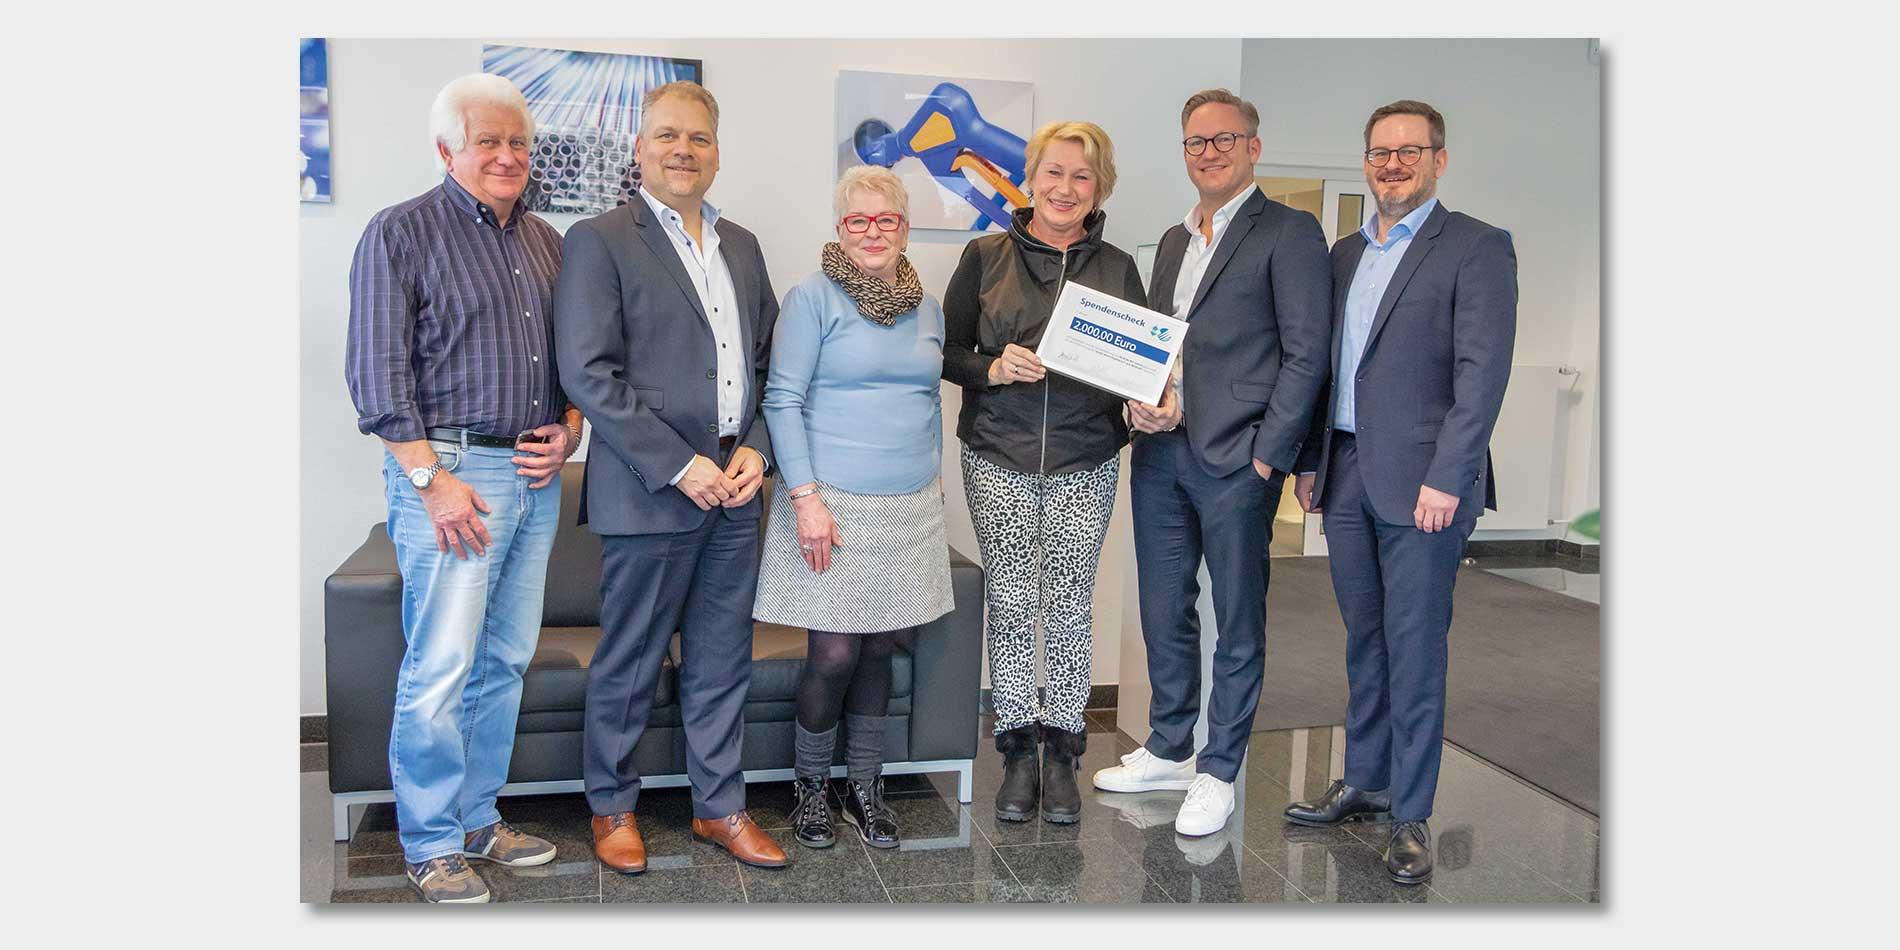 R+M de Wit spendet € 2.000 an den Wunschzettel e.V.